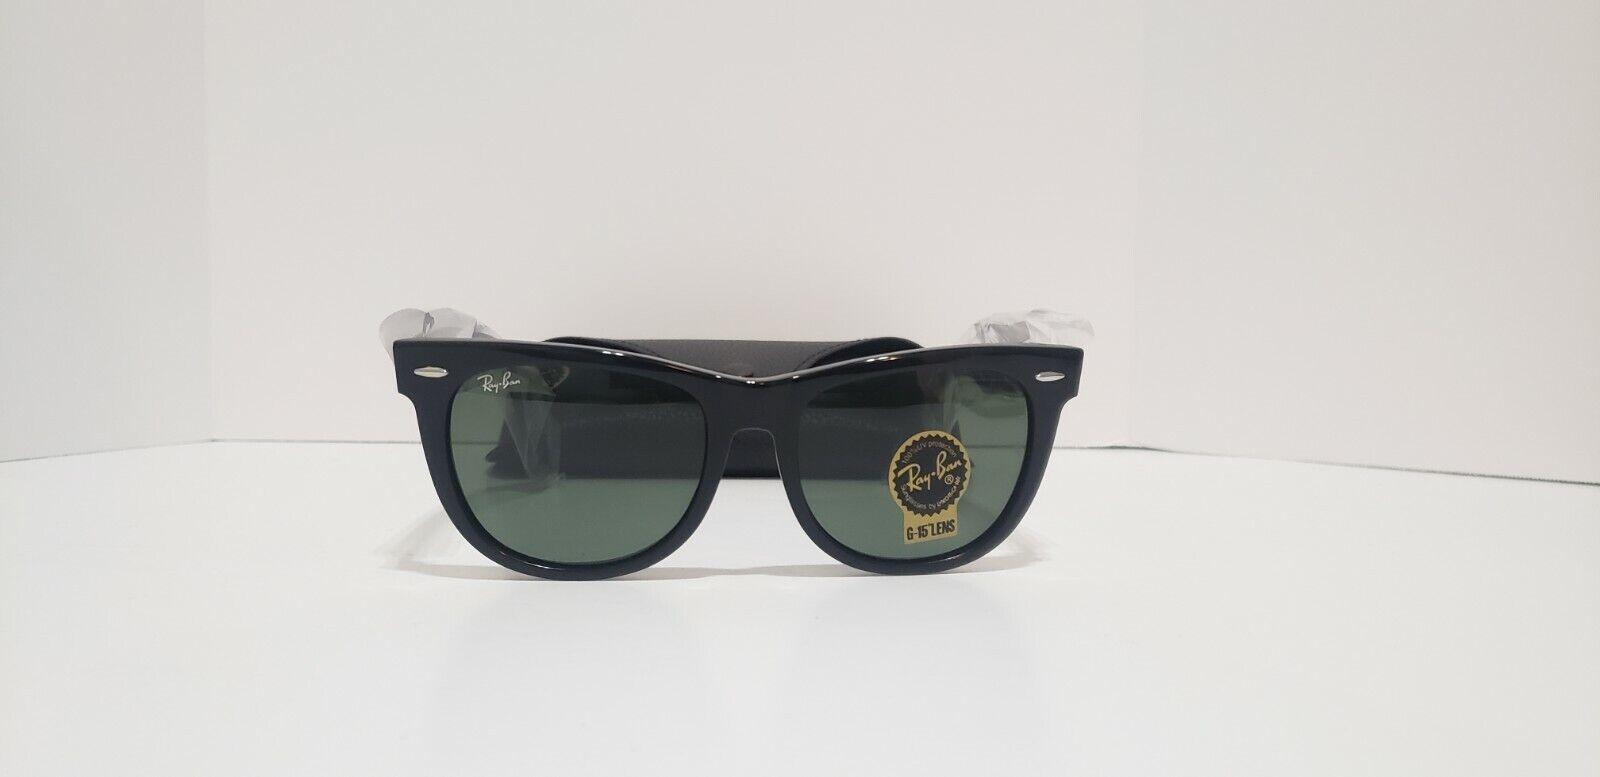 RayBan RB2140 Classic Wayfarer Sunglasses W901 Black Frame Green Lens 54MM